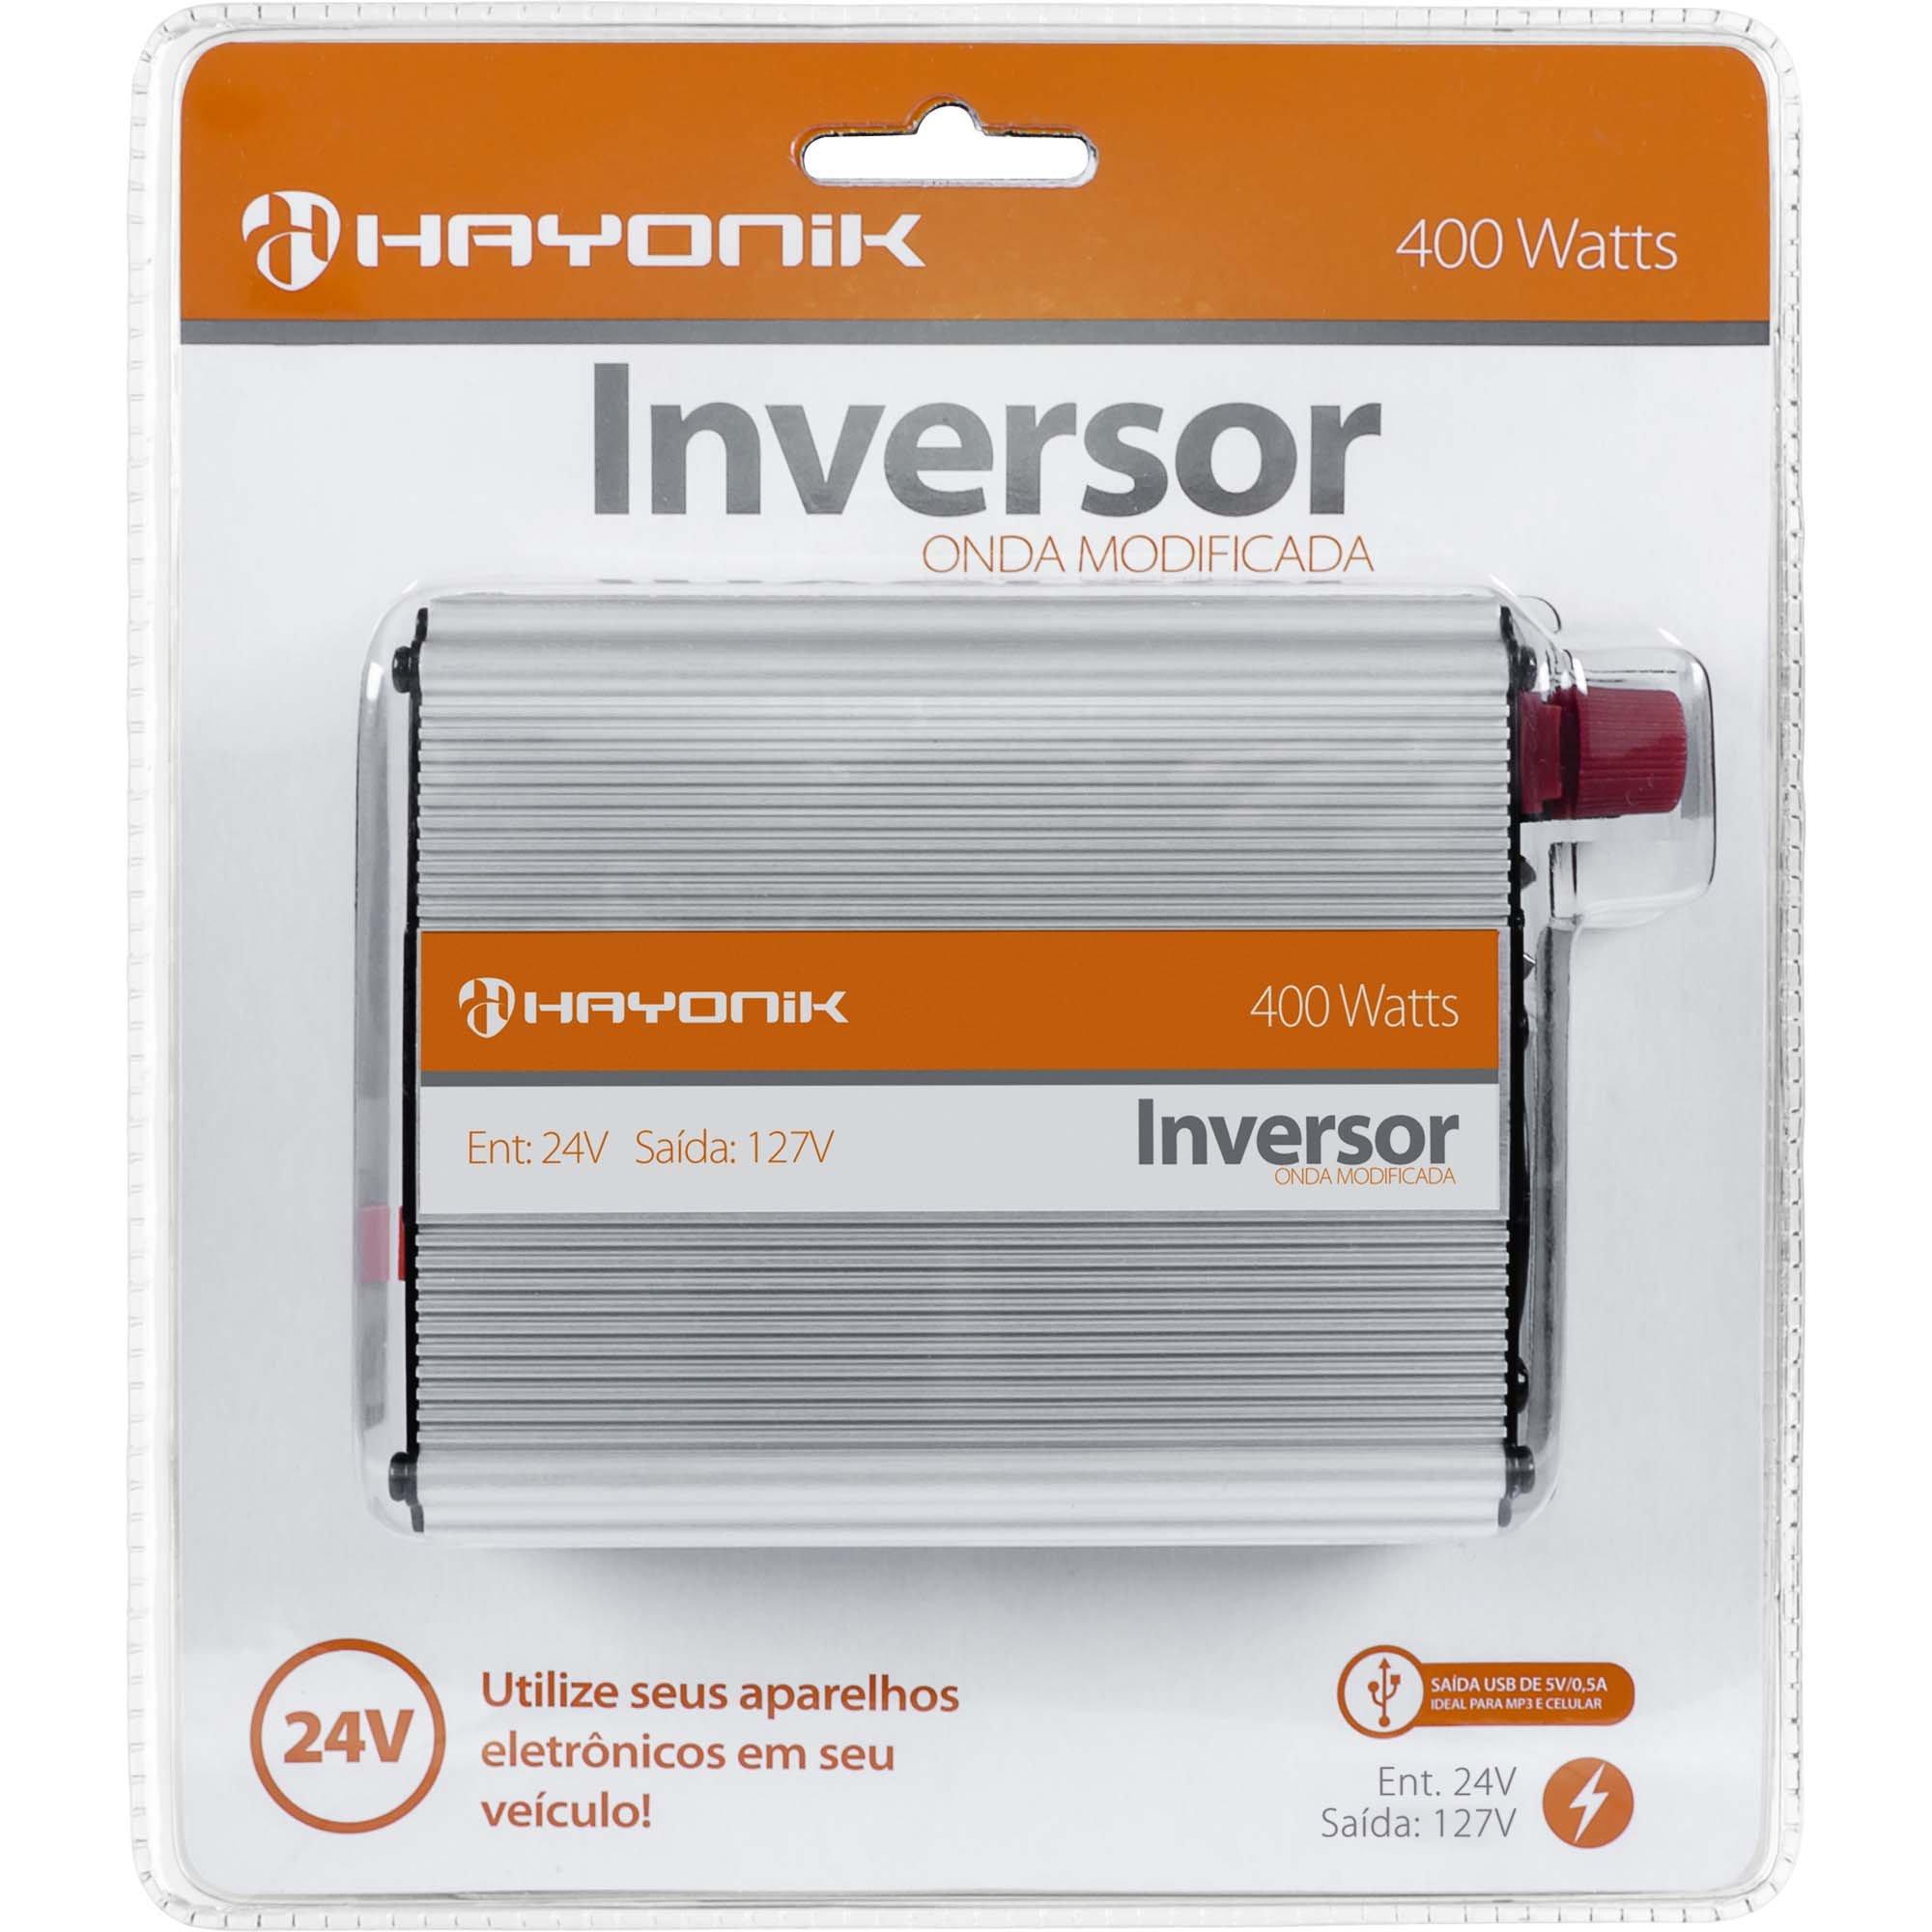 inversor onda desfrutando hayonik usb 400w modificada 24vdc 127v 40465 2000 186995